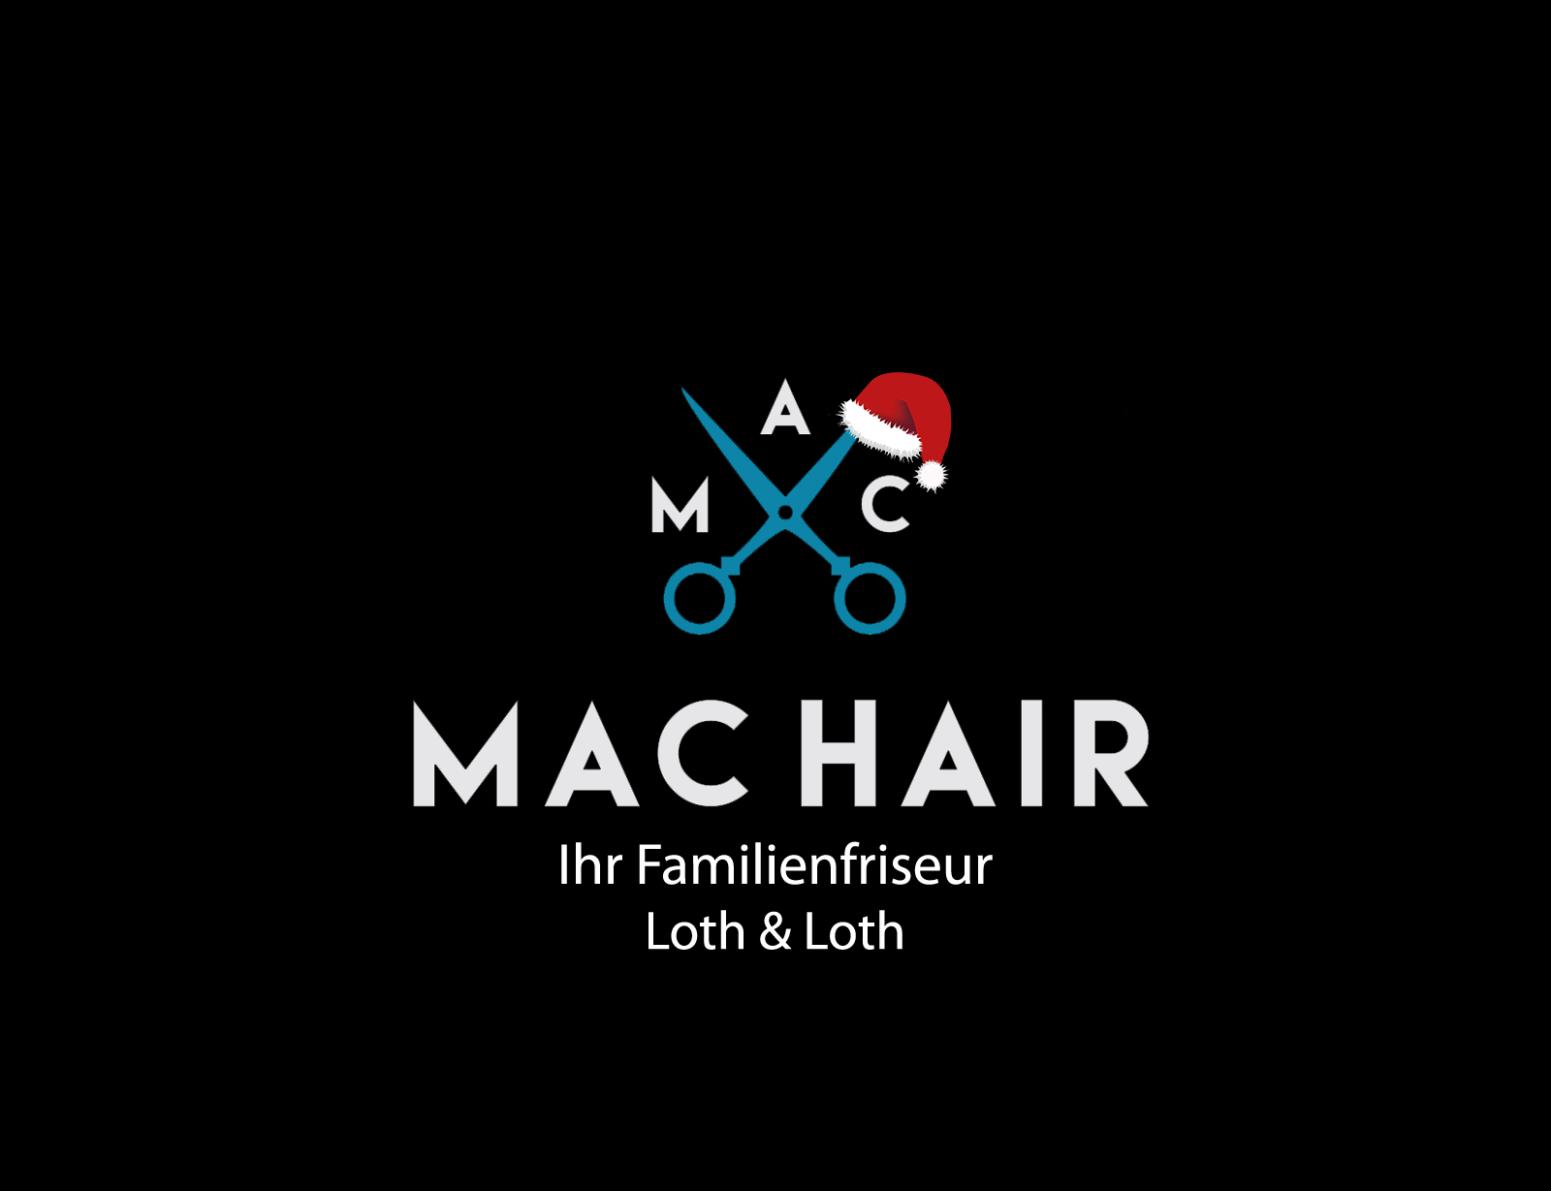 Mac Hair - Friseursalon Berlin